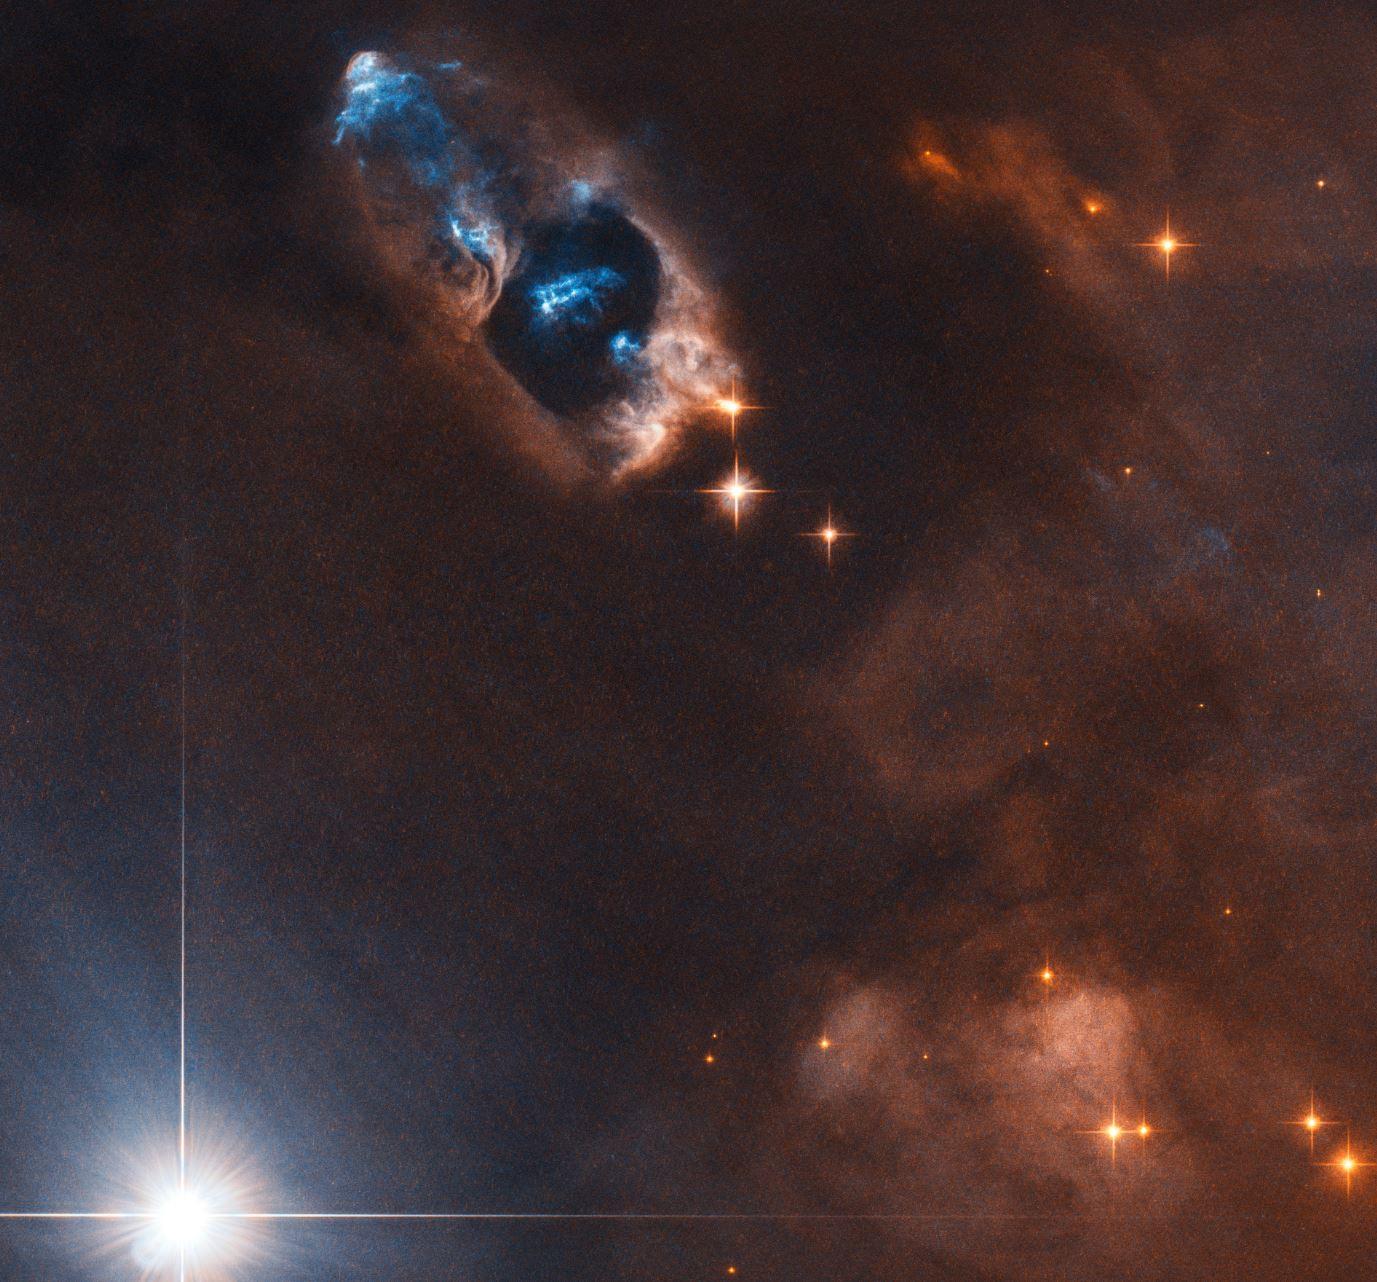 Image credit: ESA/Hubble & NASA, K.Stapelfeldt